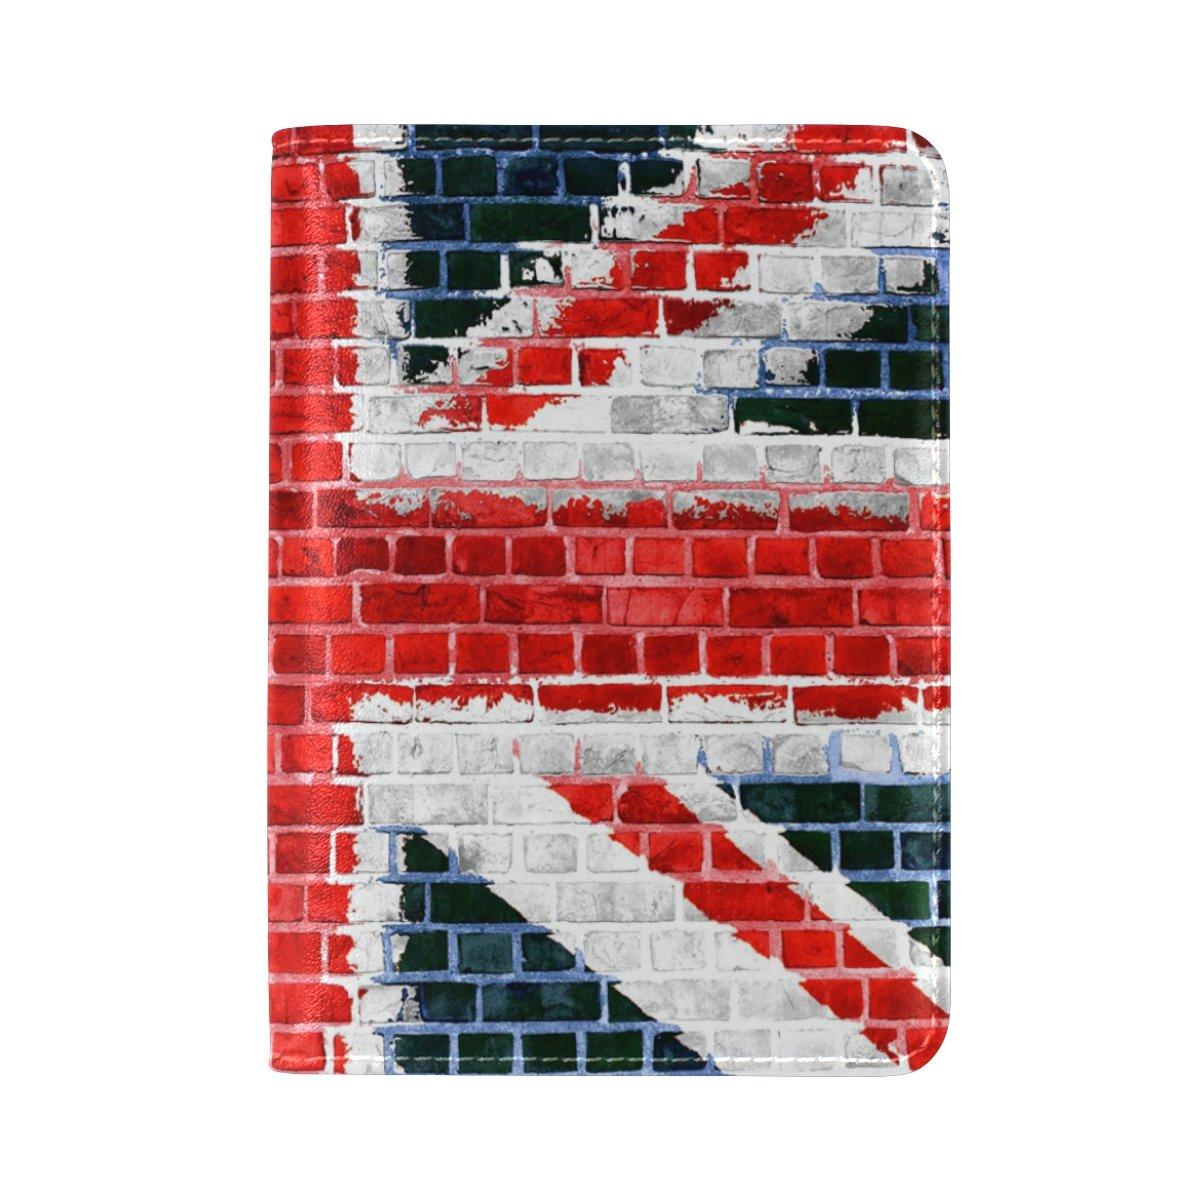 ALAZA Vintage Union Jack Flag Painted Brick Leather Passport Holder Cover Case Travel One Pocket